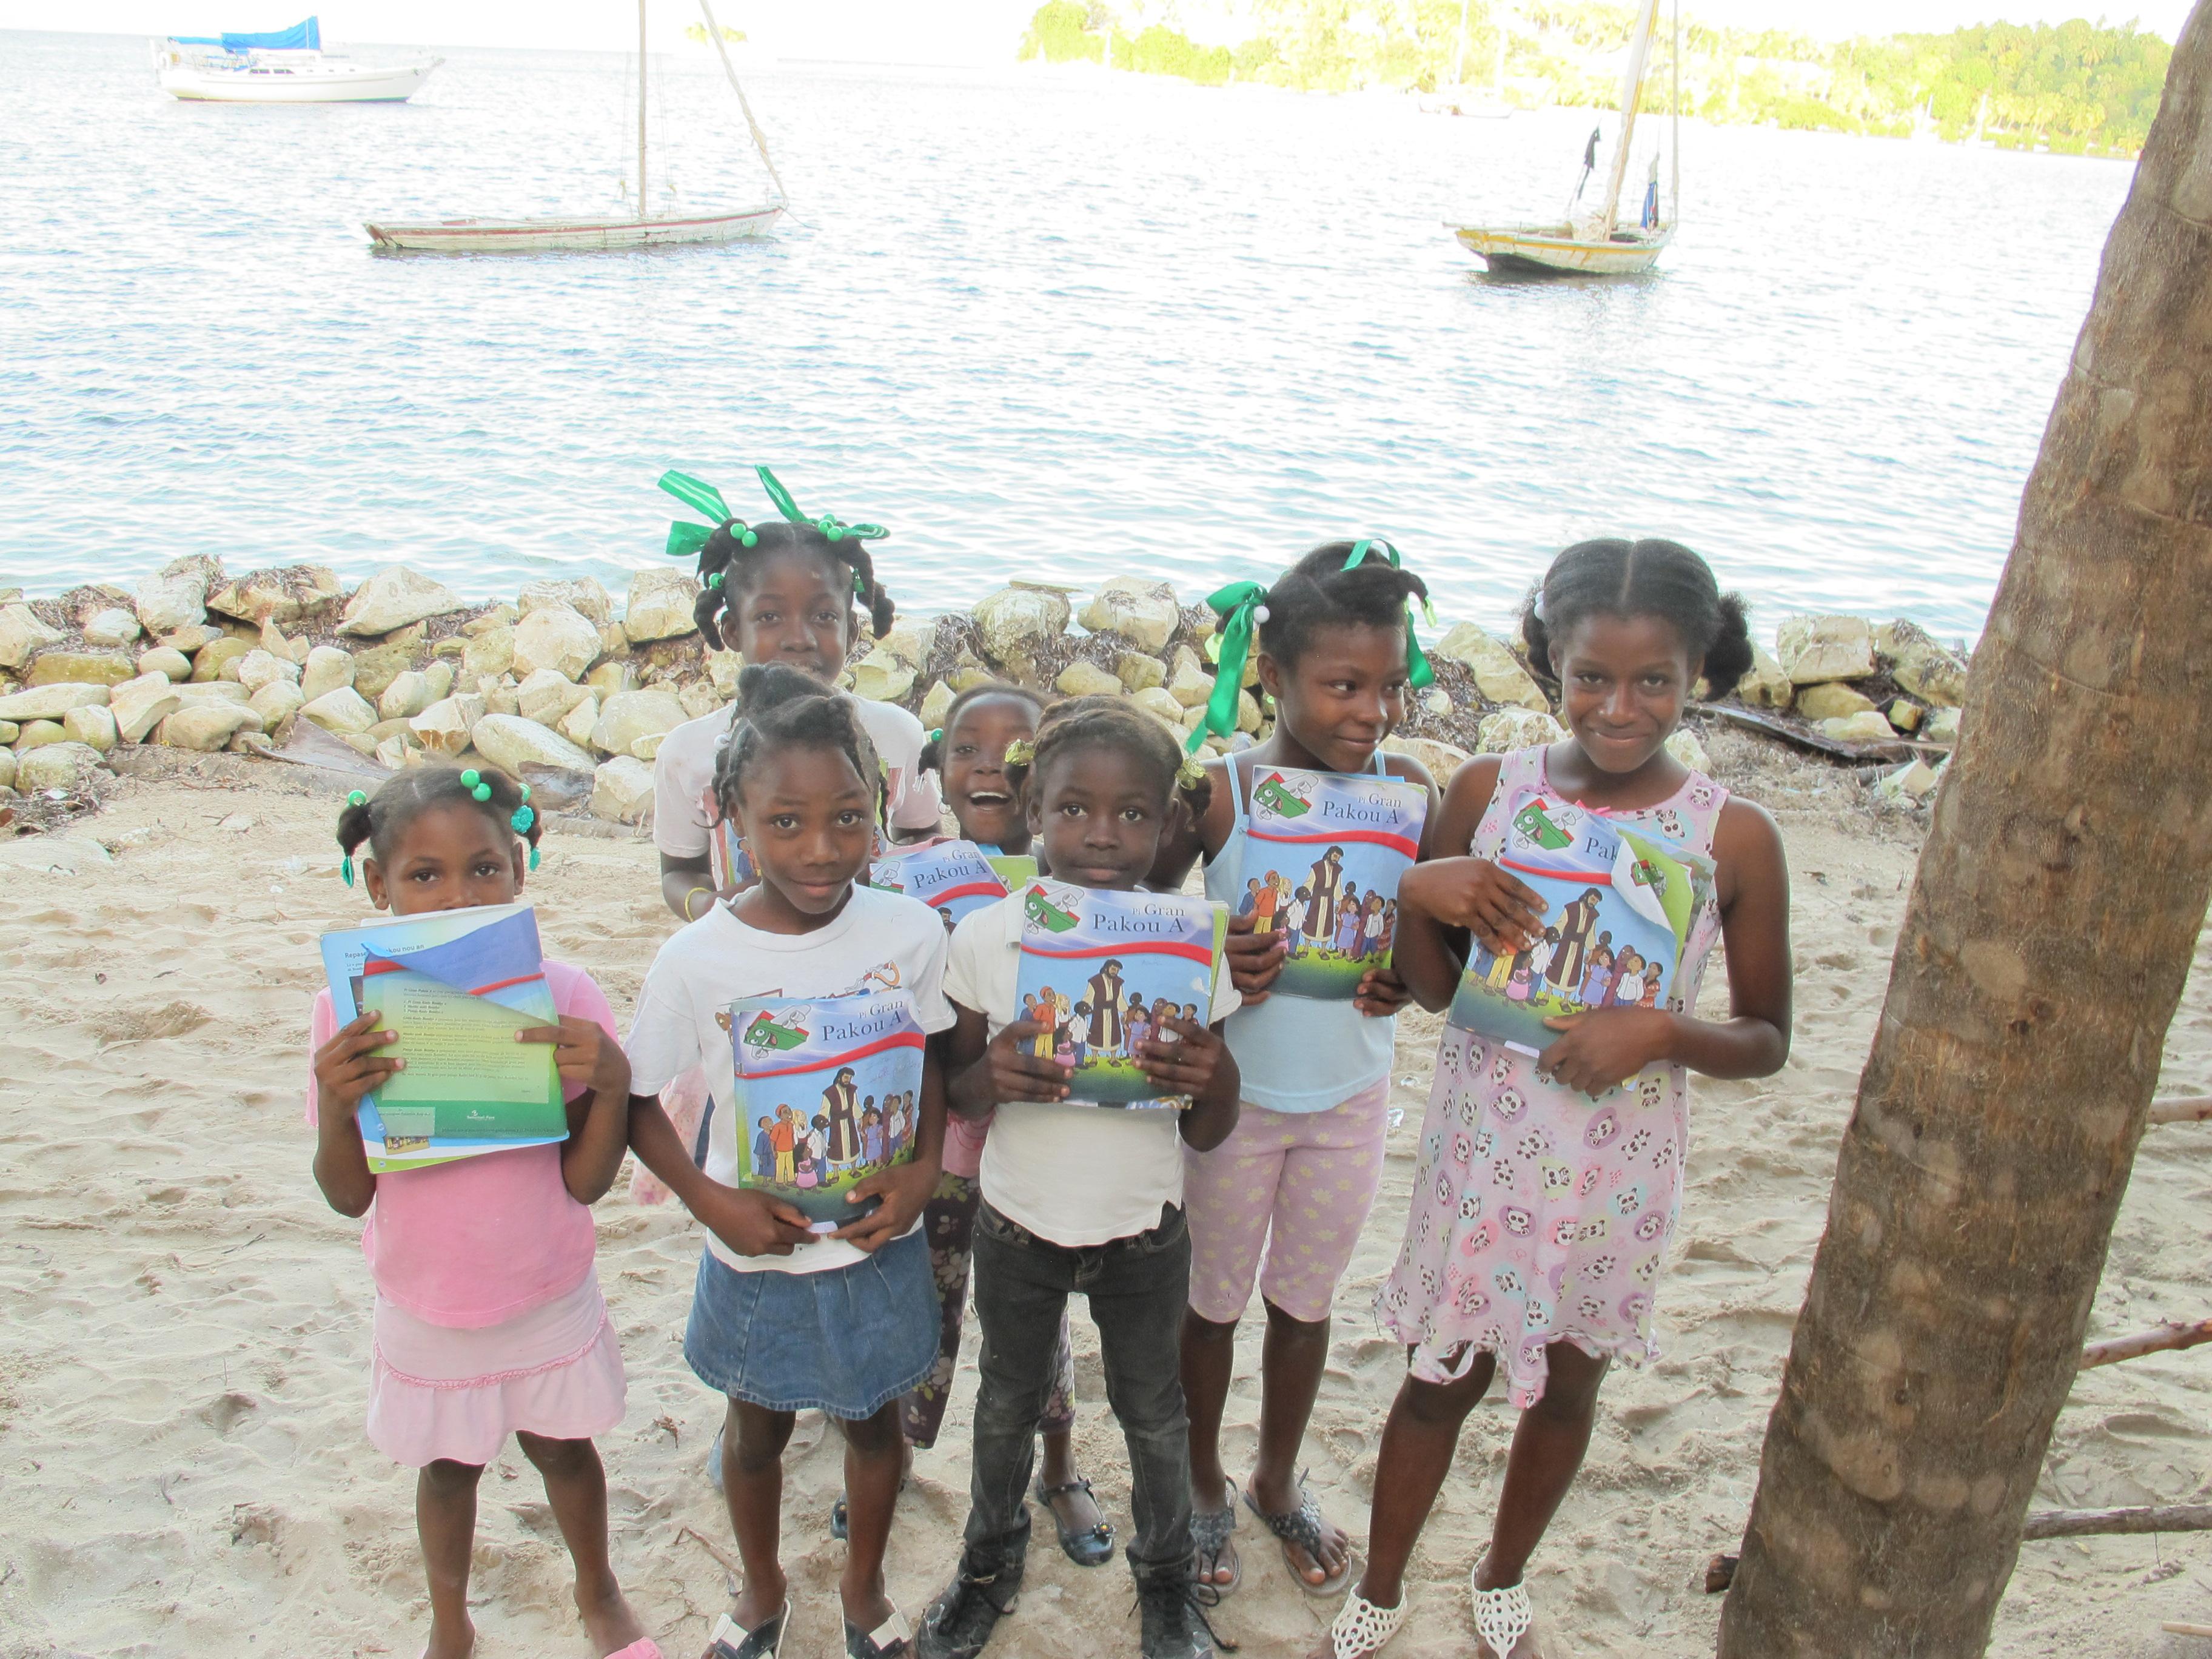 Children showing us their Greatest Journey books